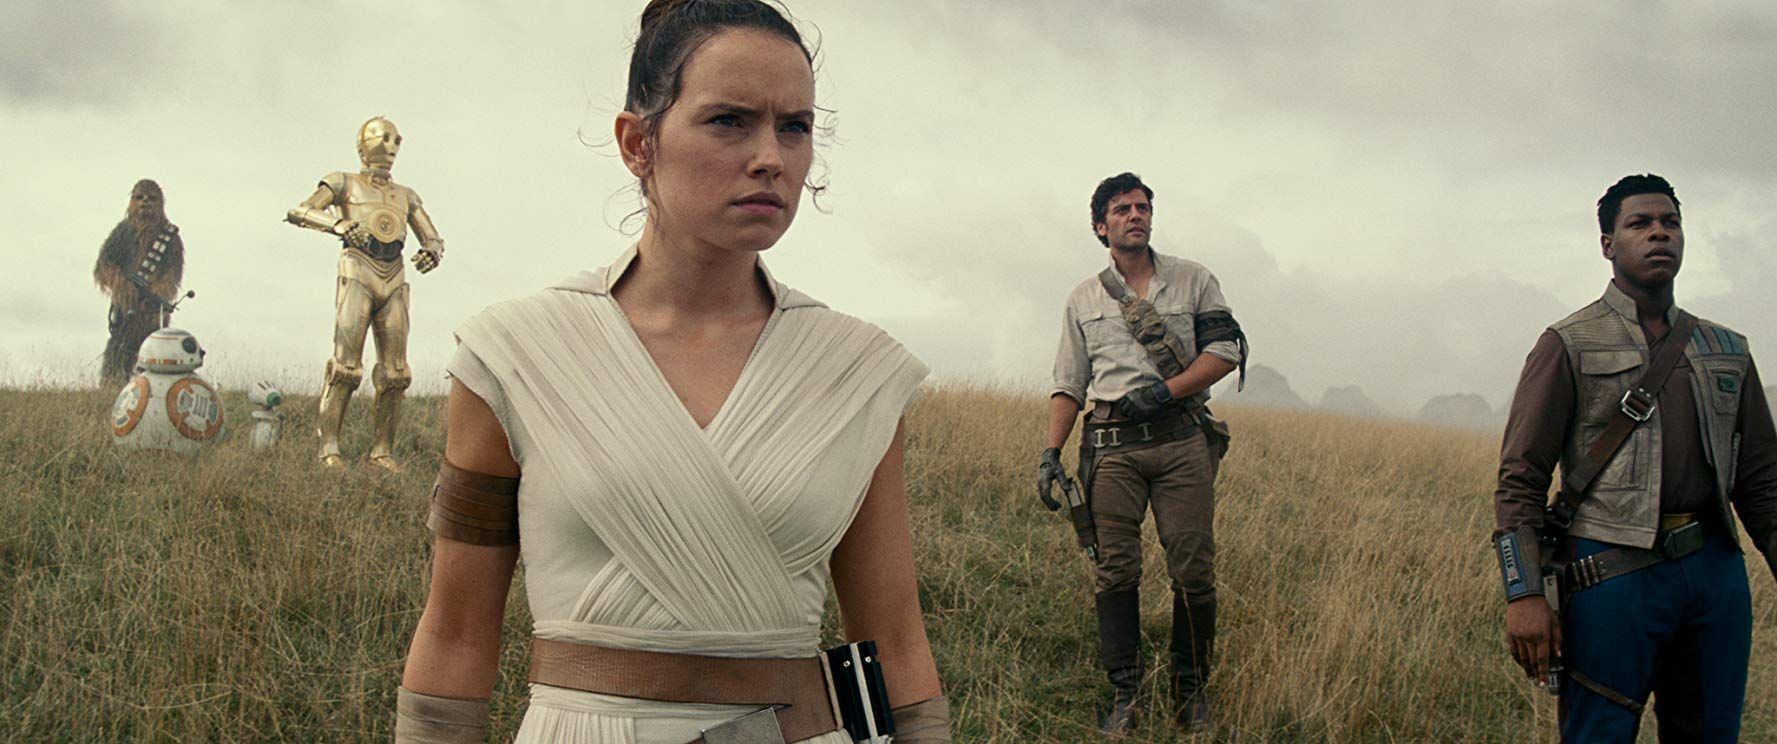 Imagen 5 de Star Wars: El Ascenso de Skywalker